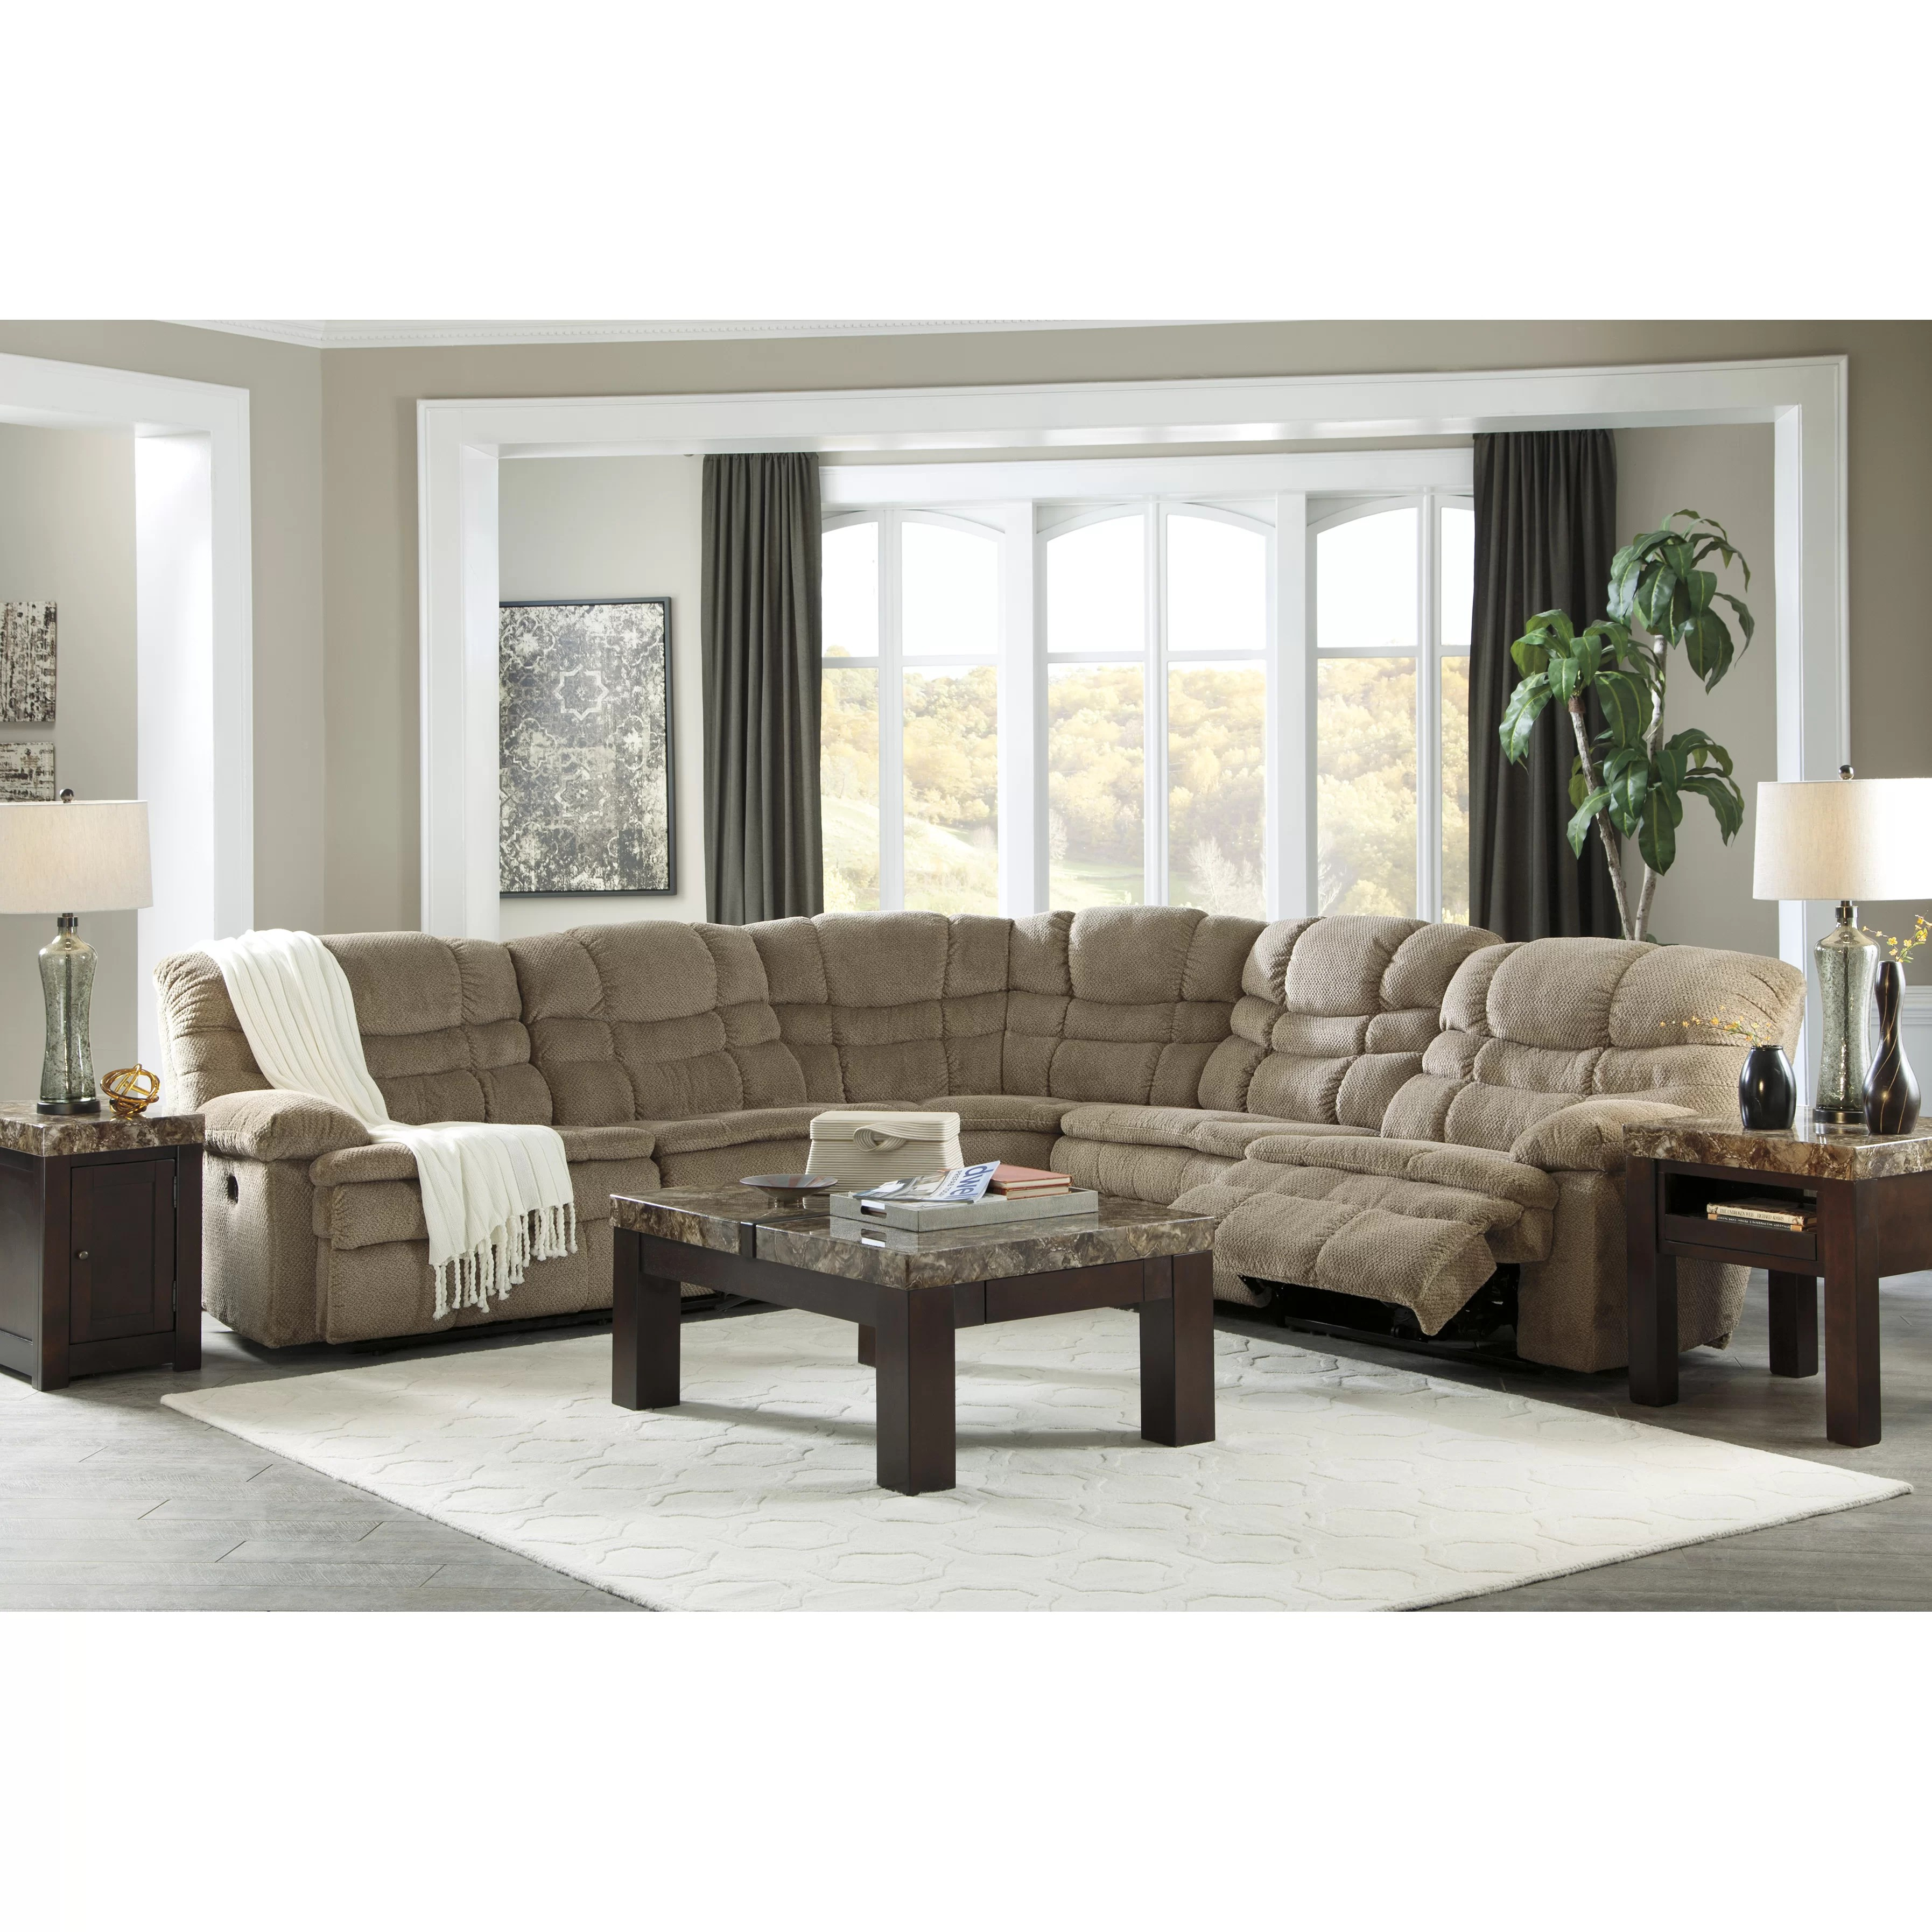 signature design by ashley harvest sleeper sofa harper simmons upholstery zavion sectional wayfair